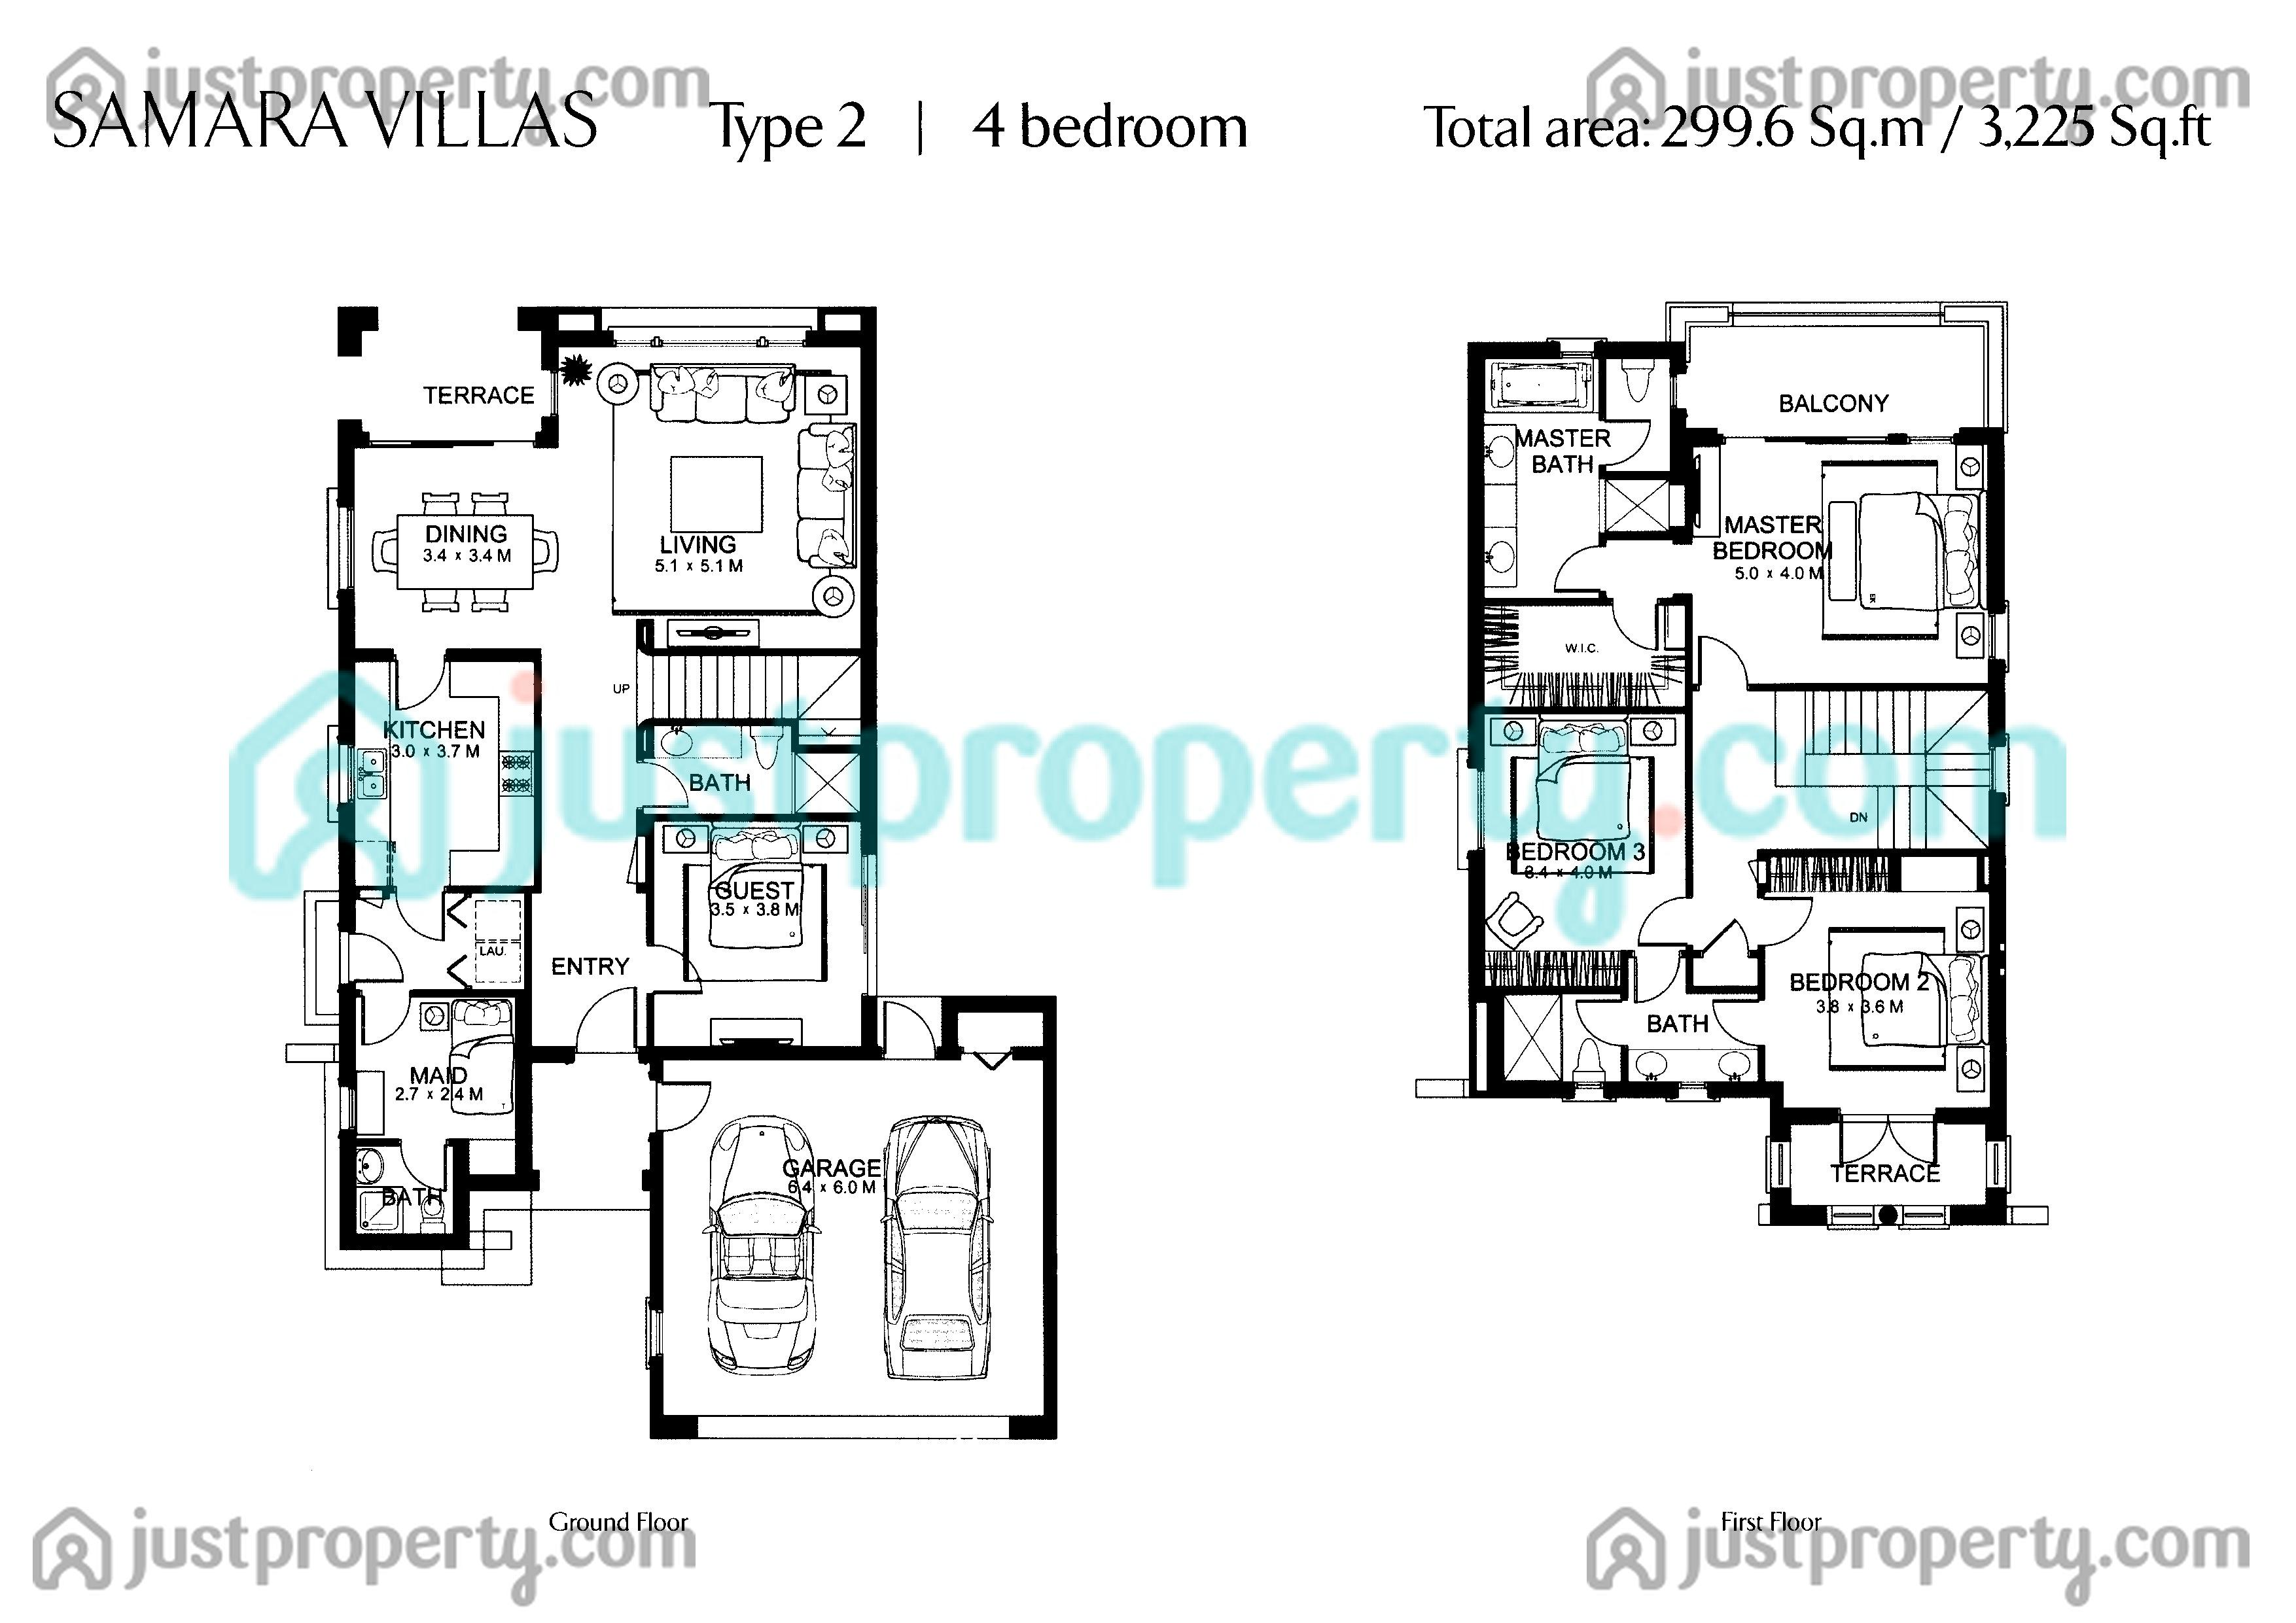 5br House Plans